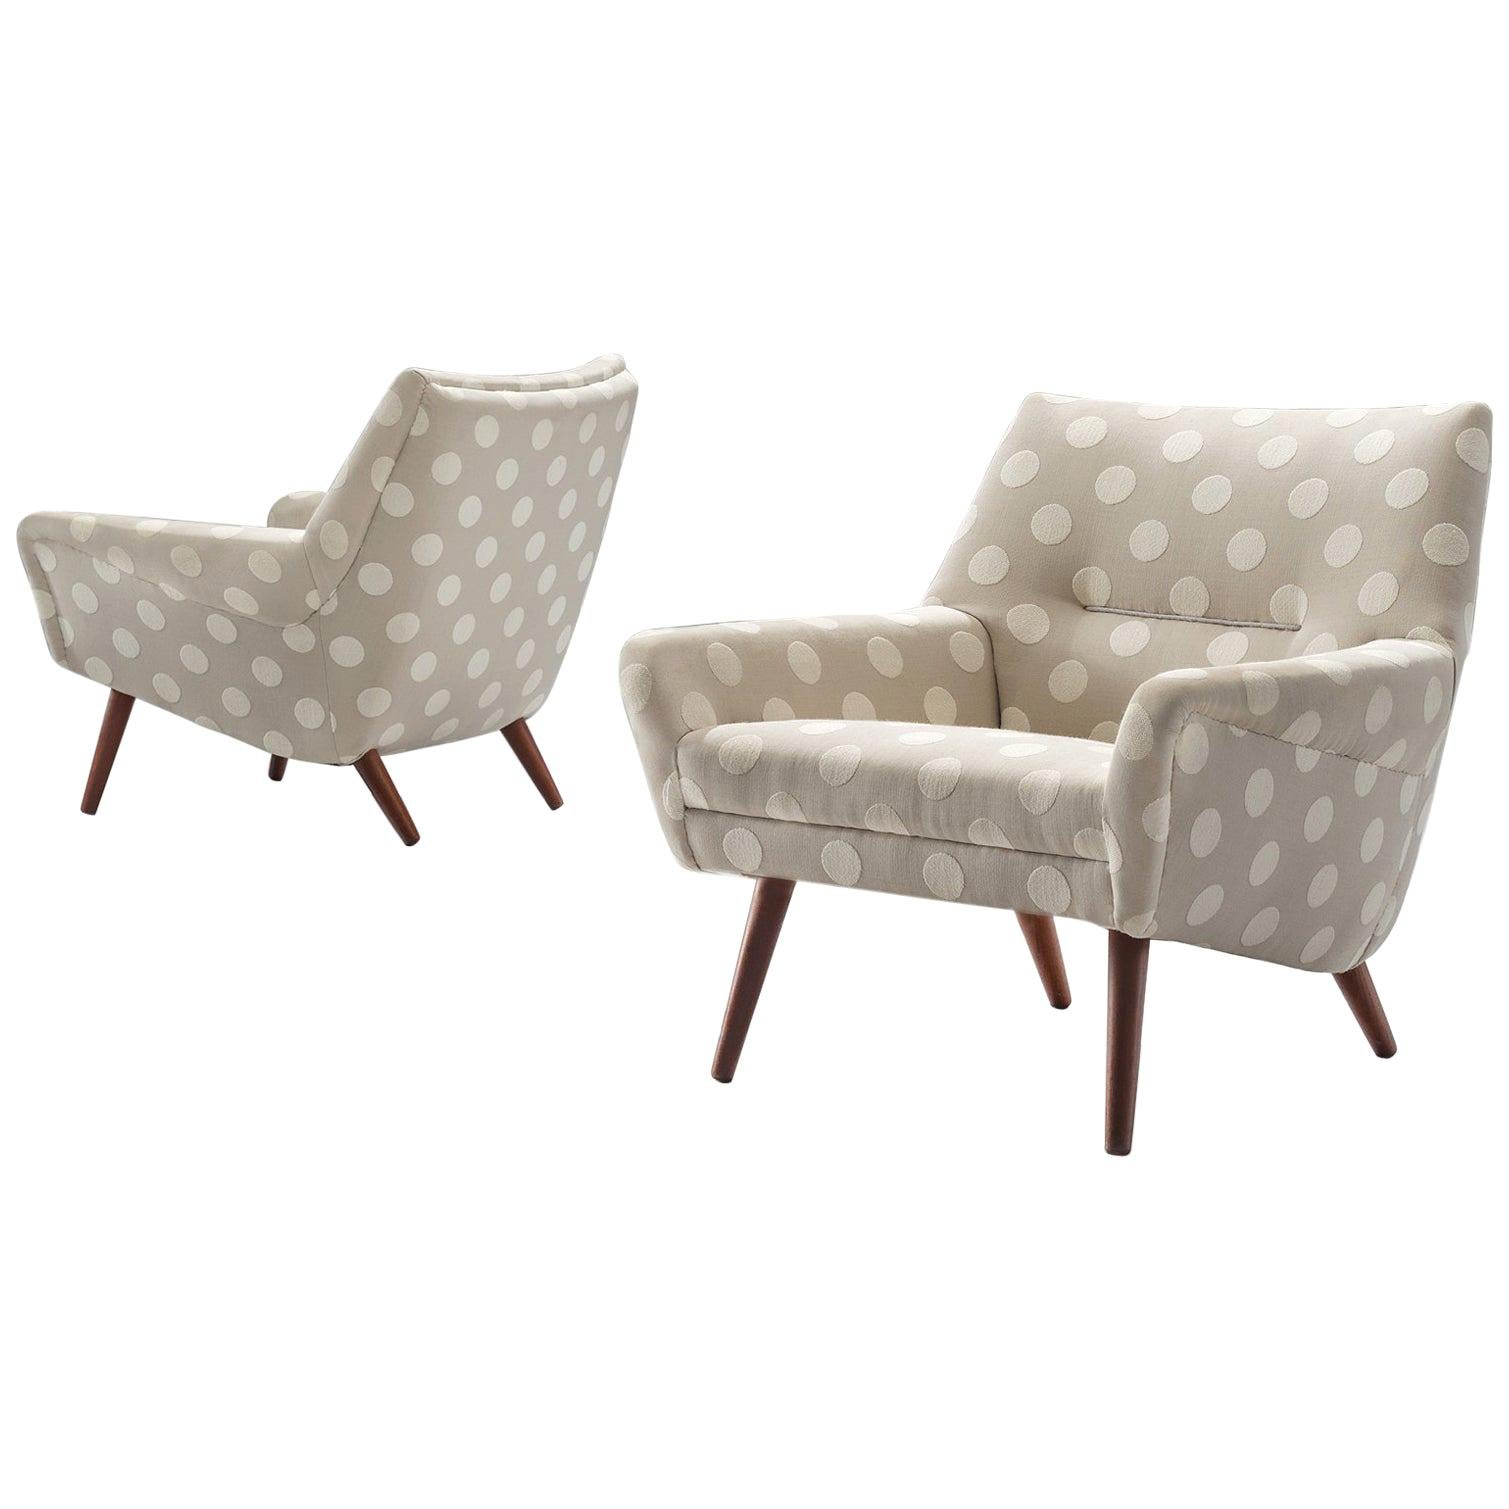 Pair of Scandinavian Easy Chairs, circa 1960